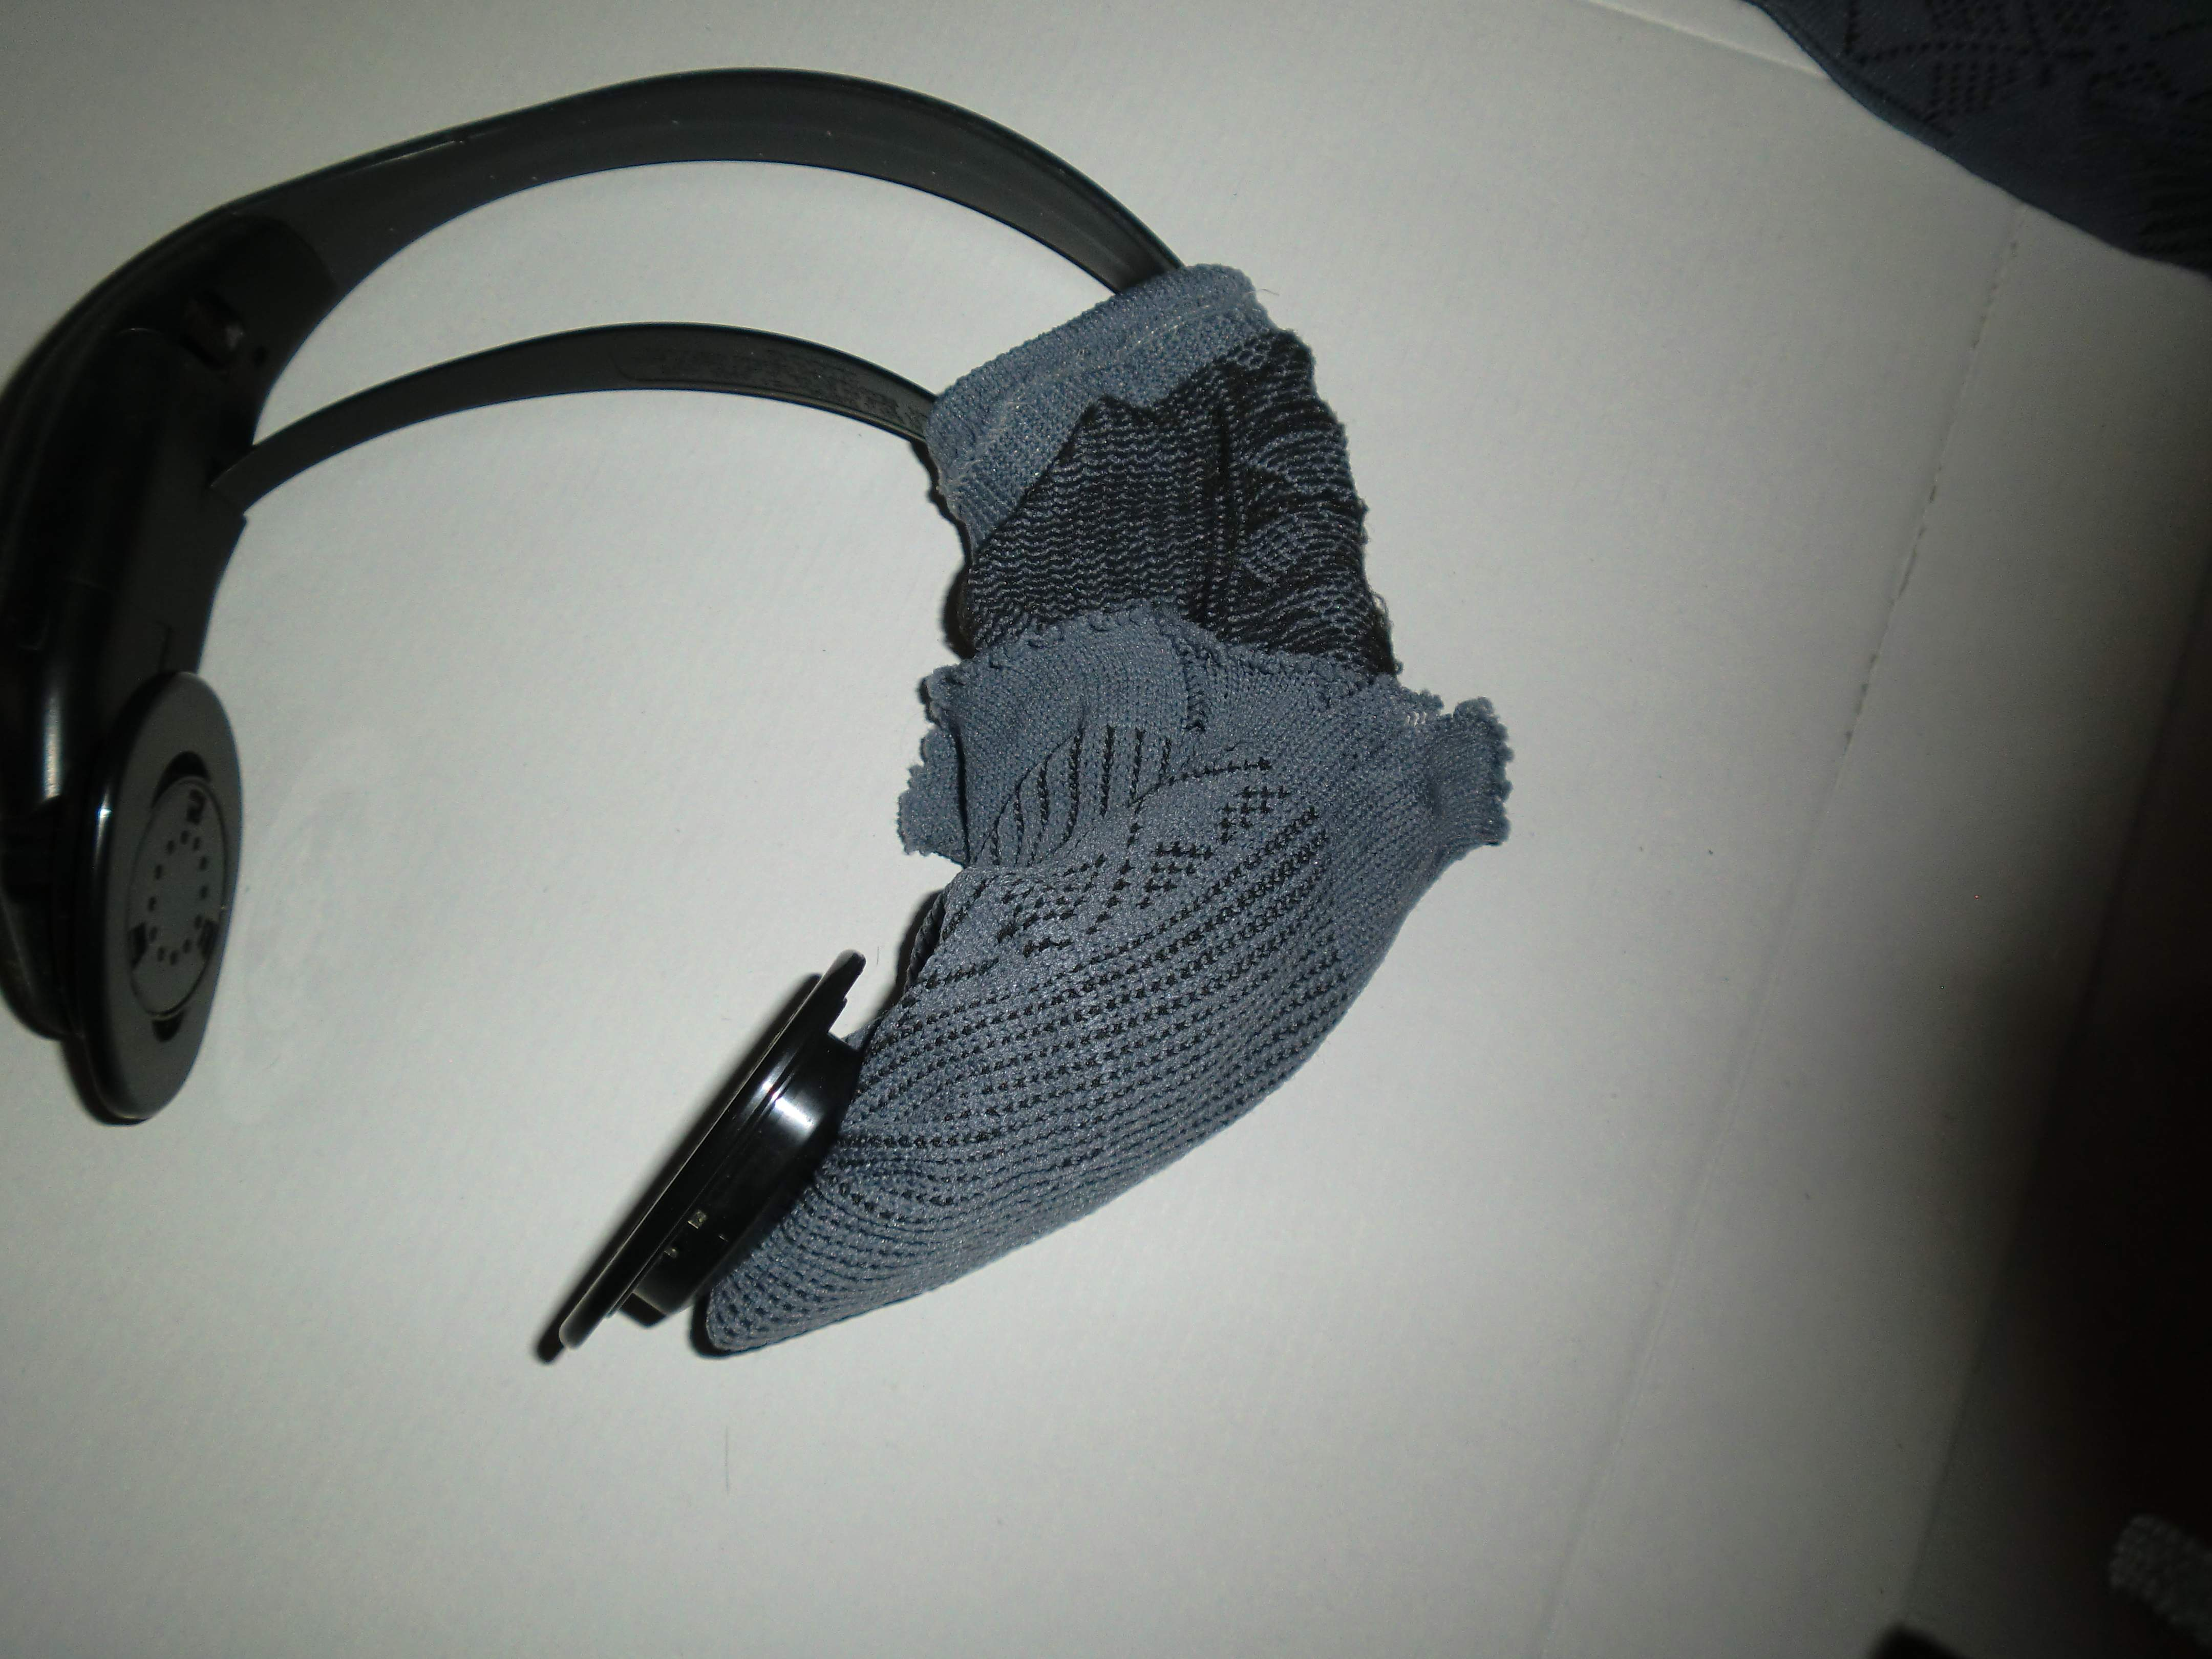 Picture of Setting Rubber Band and Inserting Headphones / Poniendo La Goma E Insertandolo En Los Auriculares